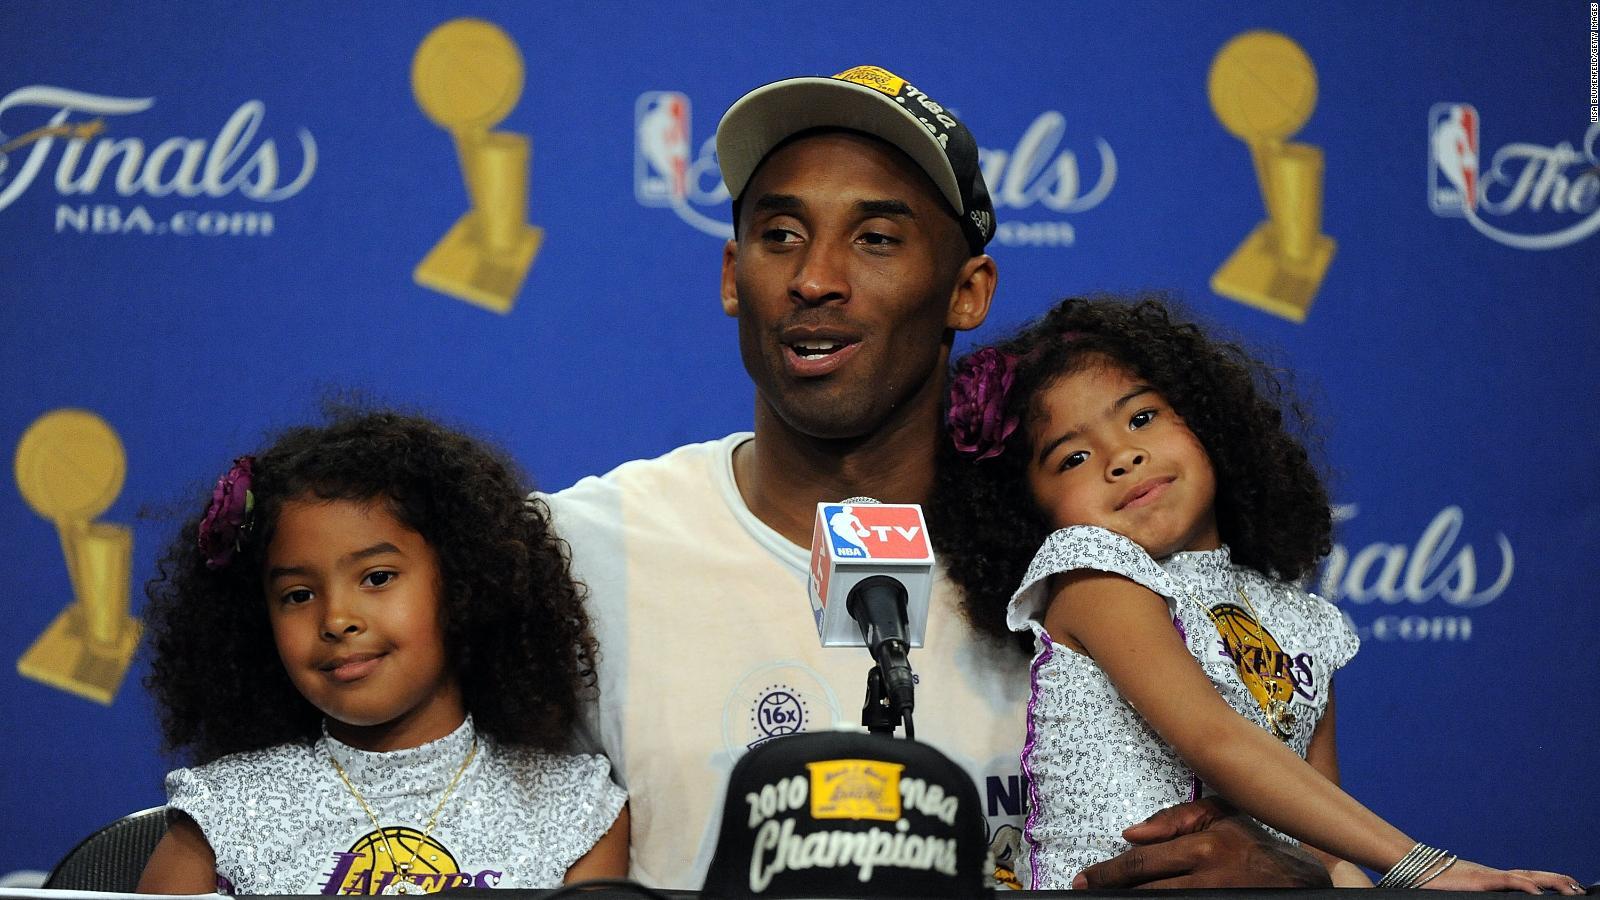 Anchor's touching Kobe Bryant tribute sparks #GirlDad trend